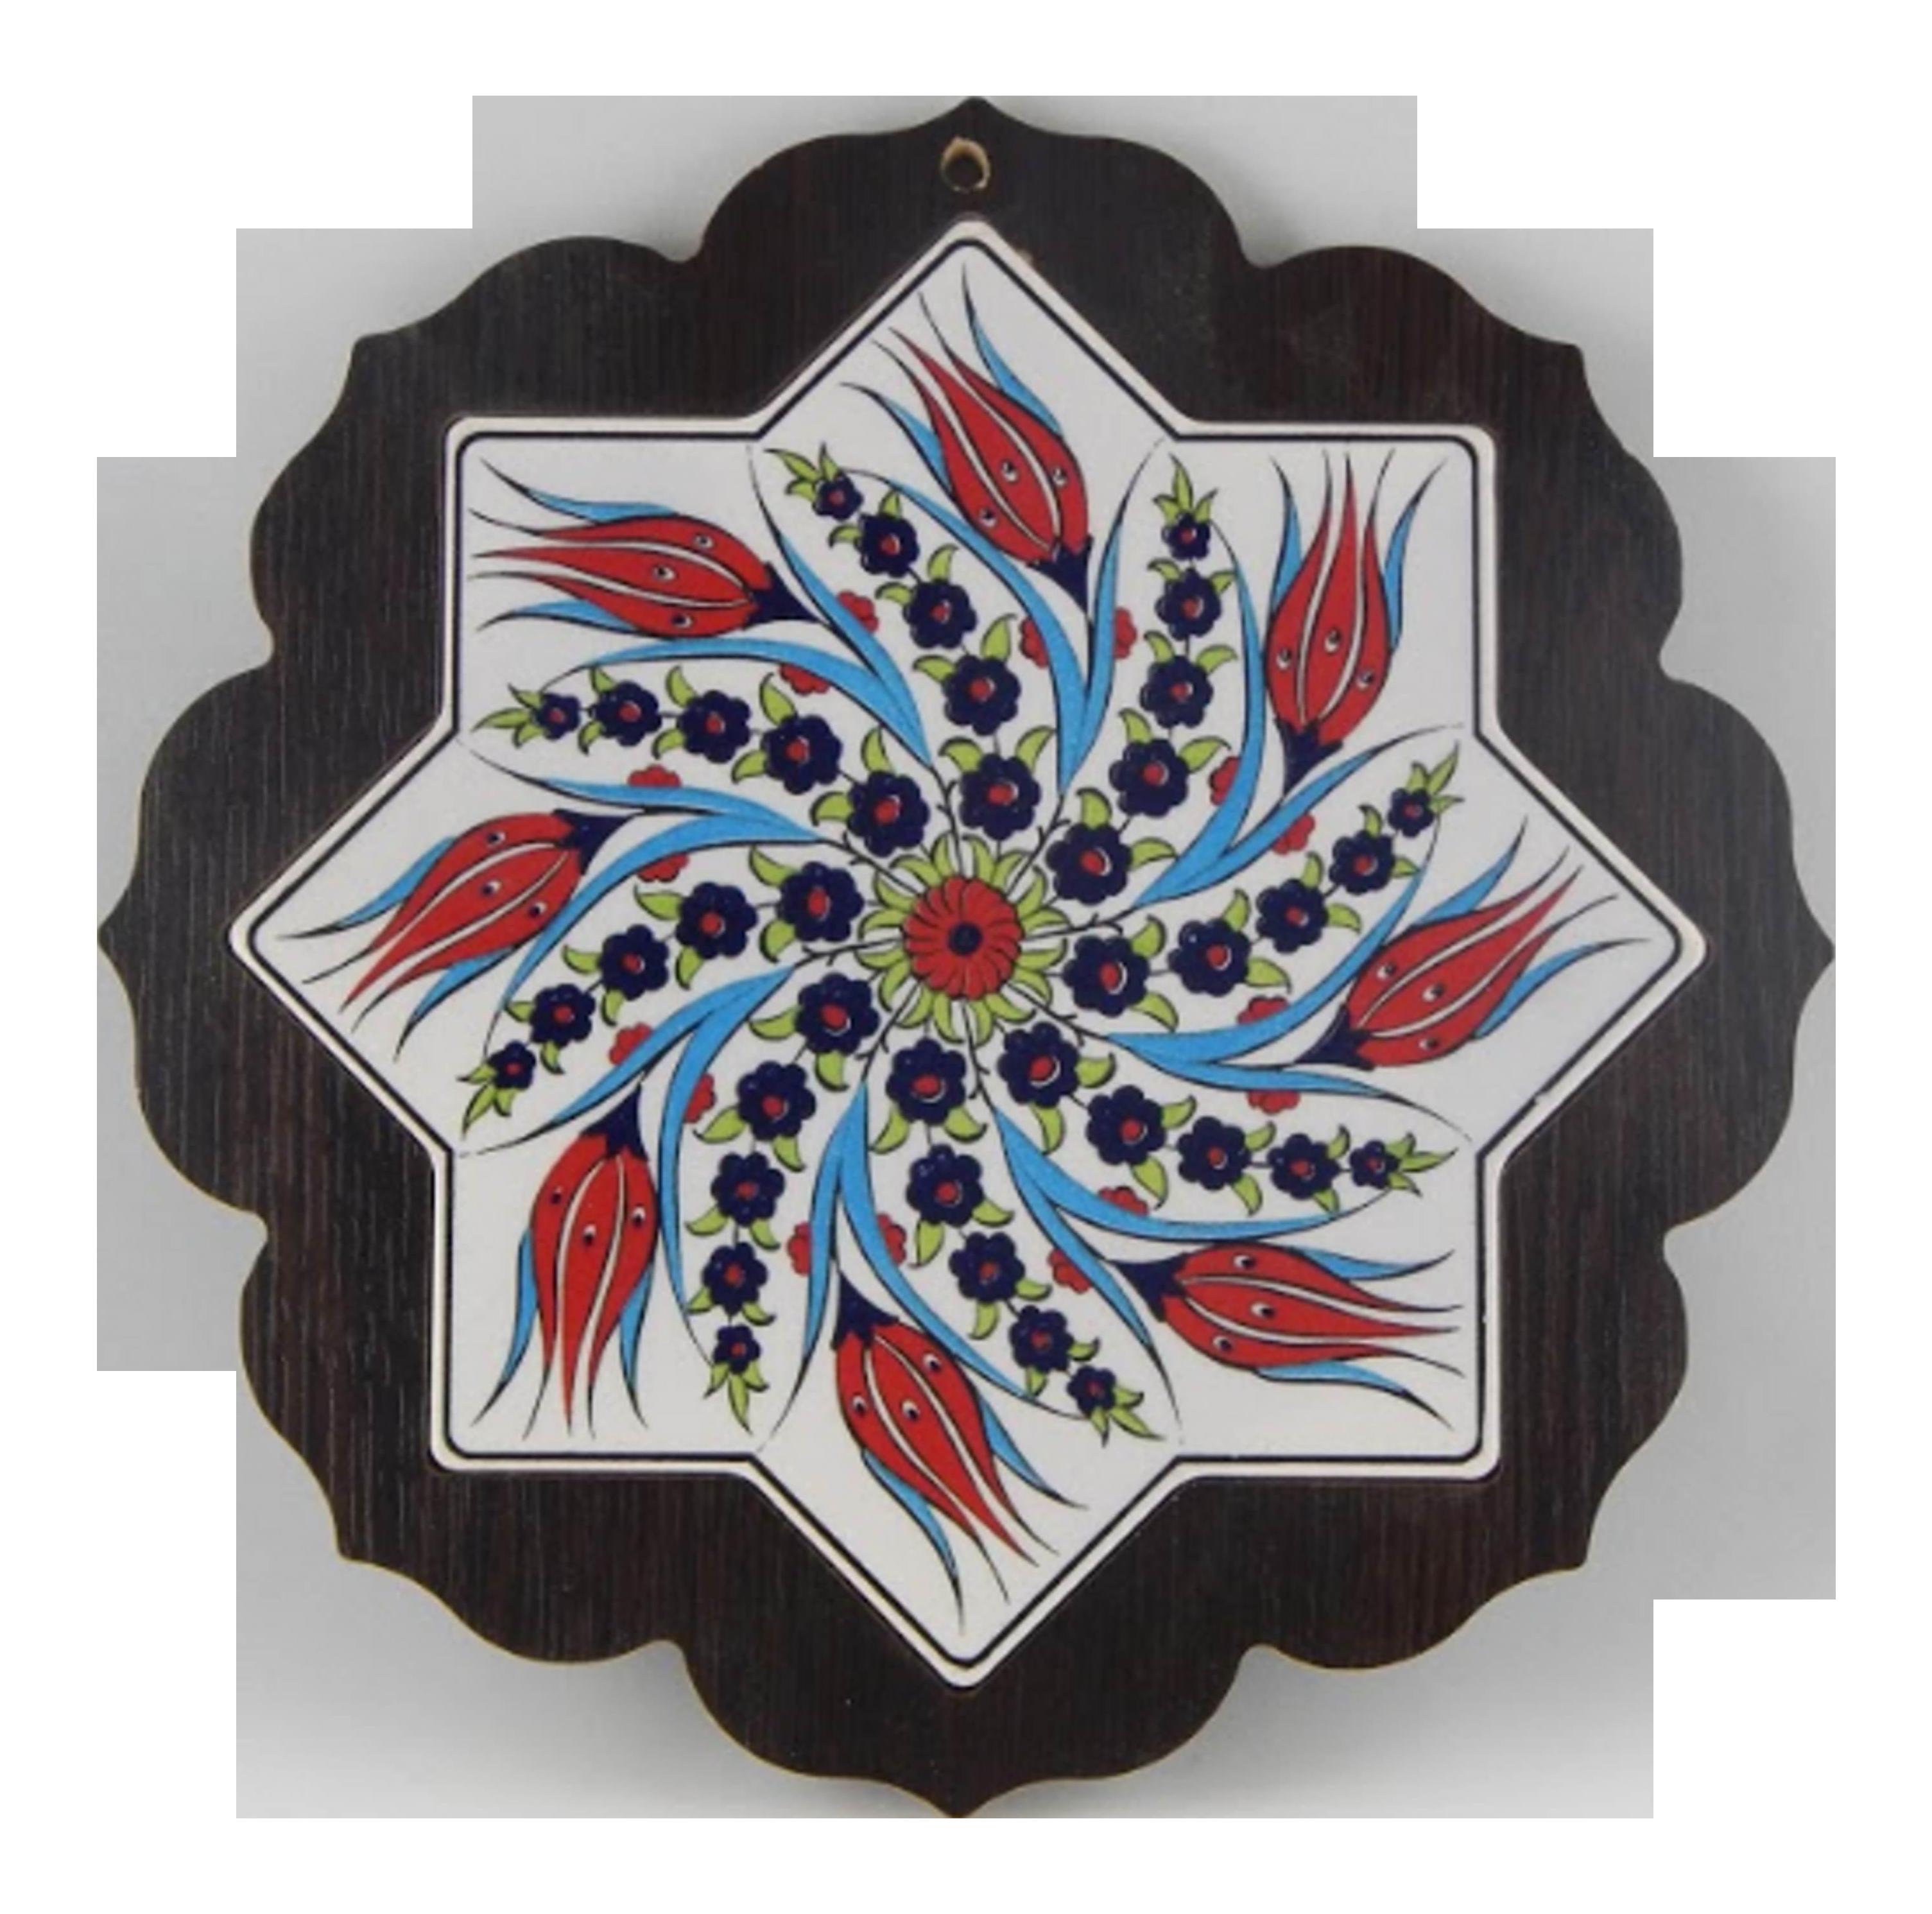 Turkish Ceramic Wall Hanging With Wooden Frame Round Hanging Decoration Chairish